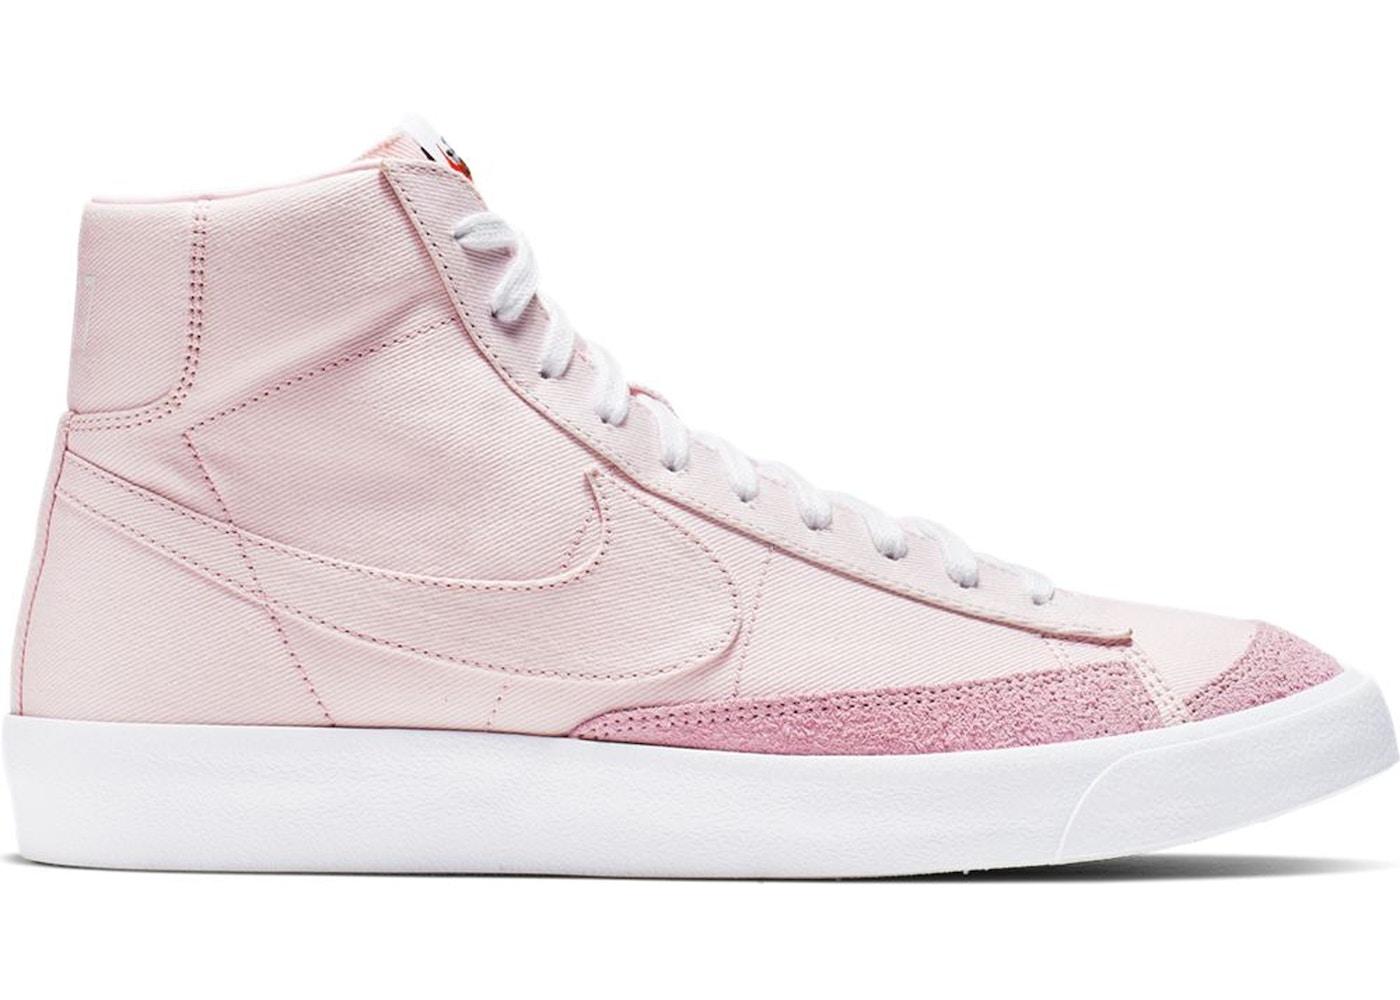 Nike Blazer Mid 77 Vintage Pink Foam